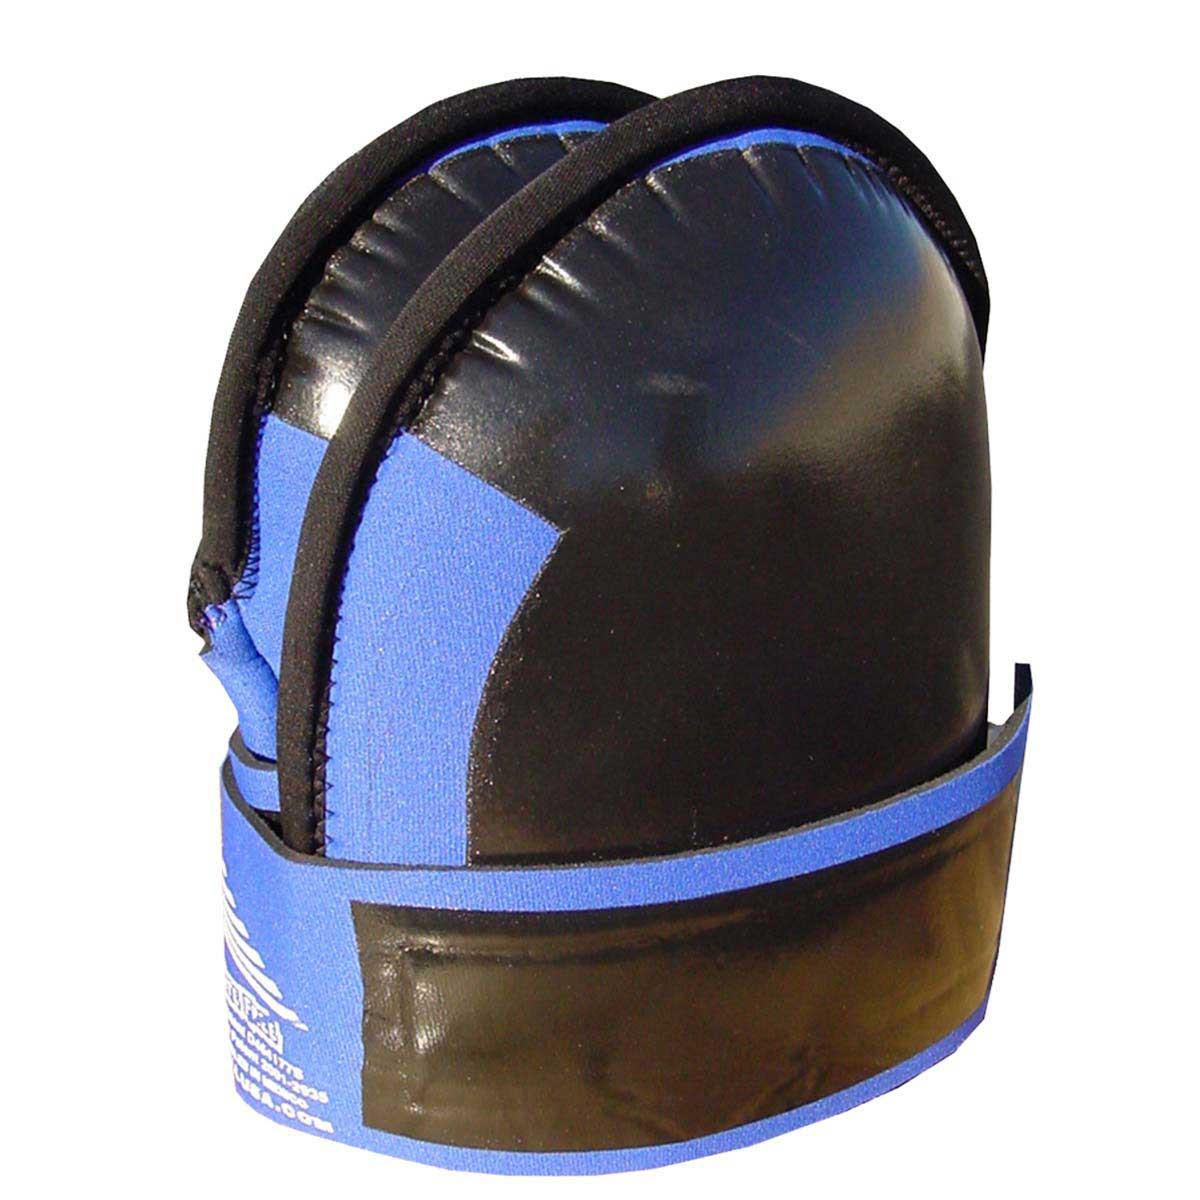 Supersoft Kneepads Tiling Knee Pad